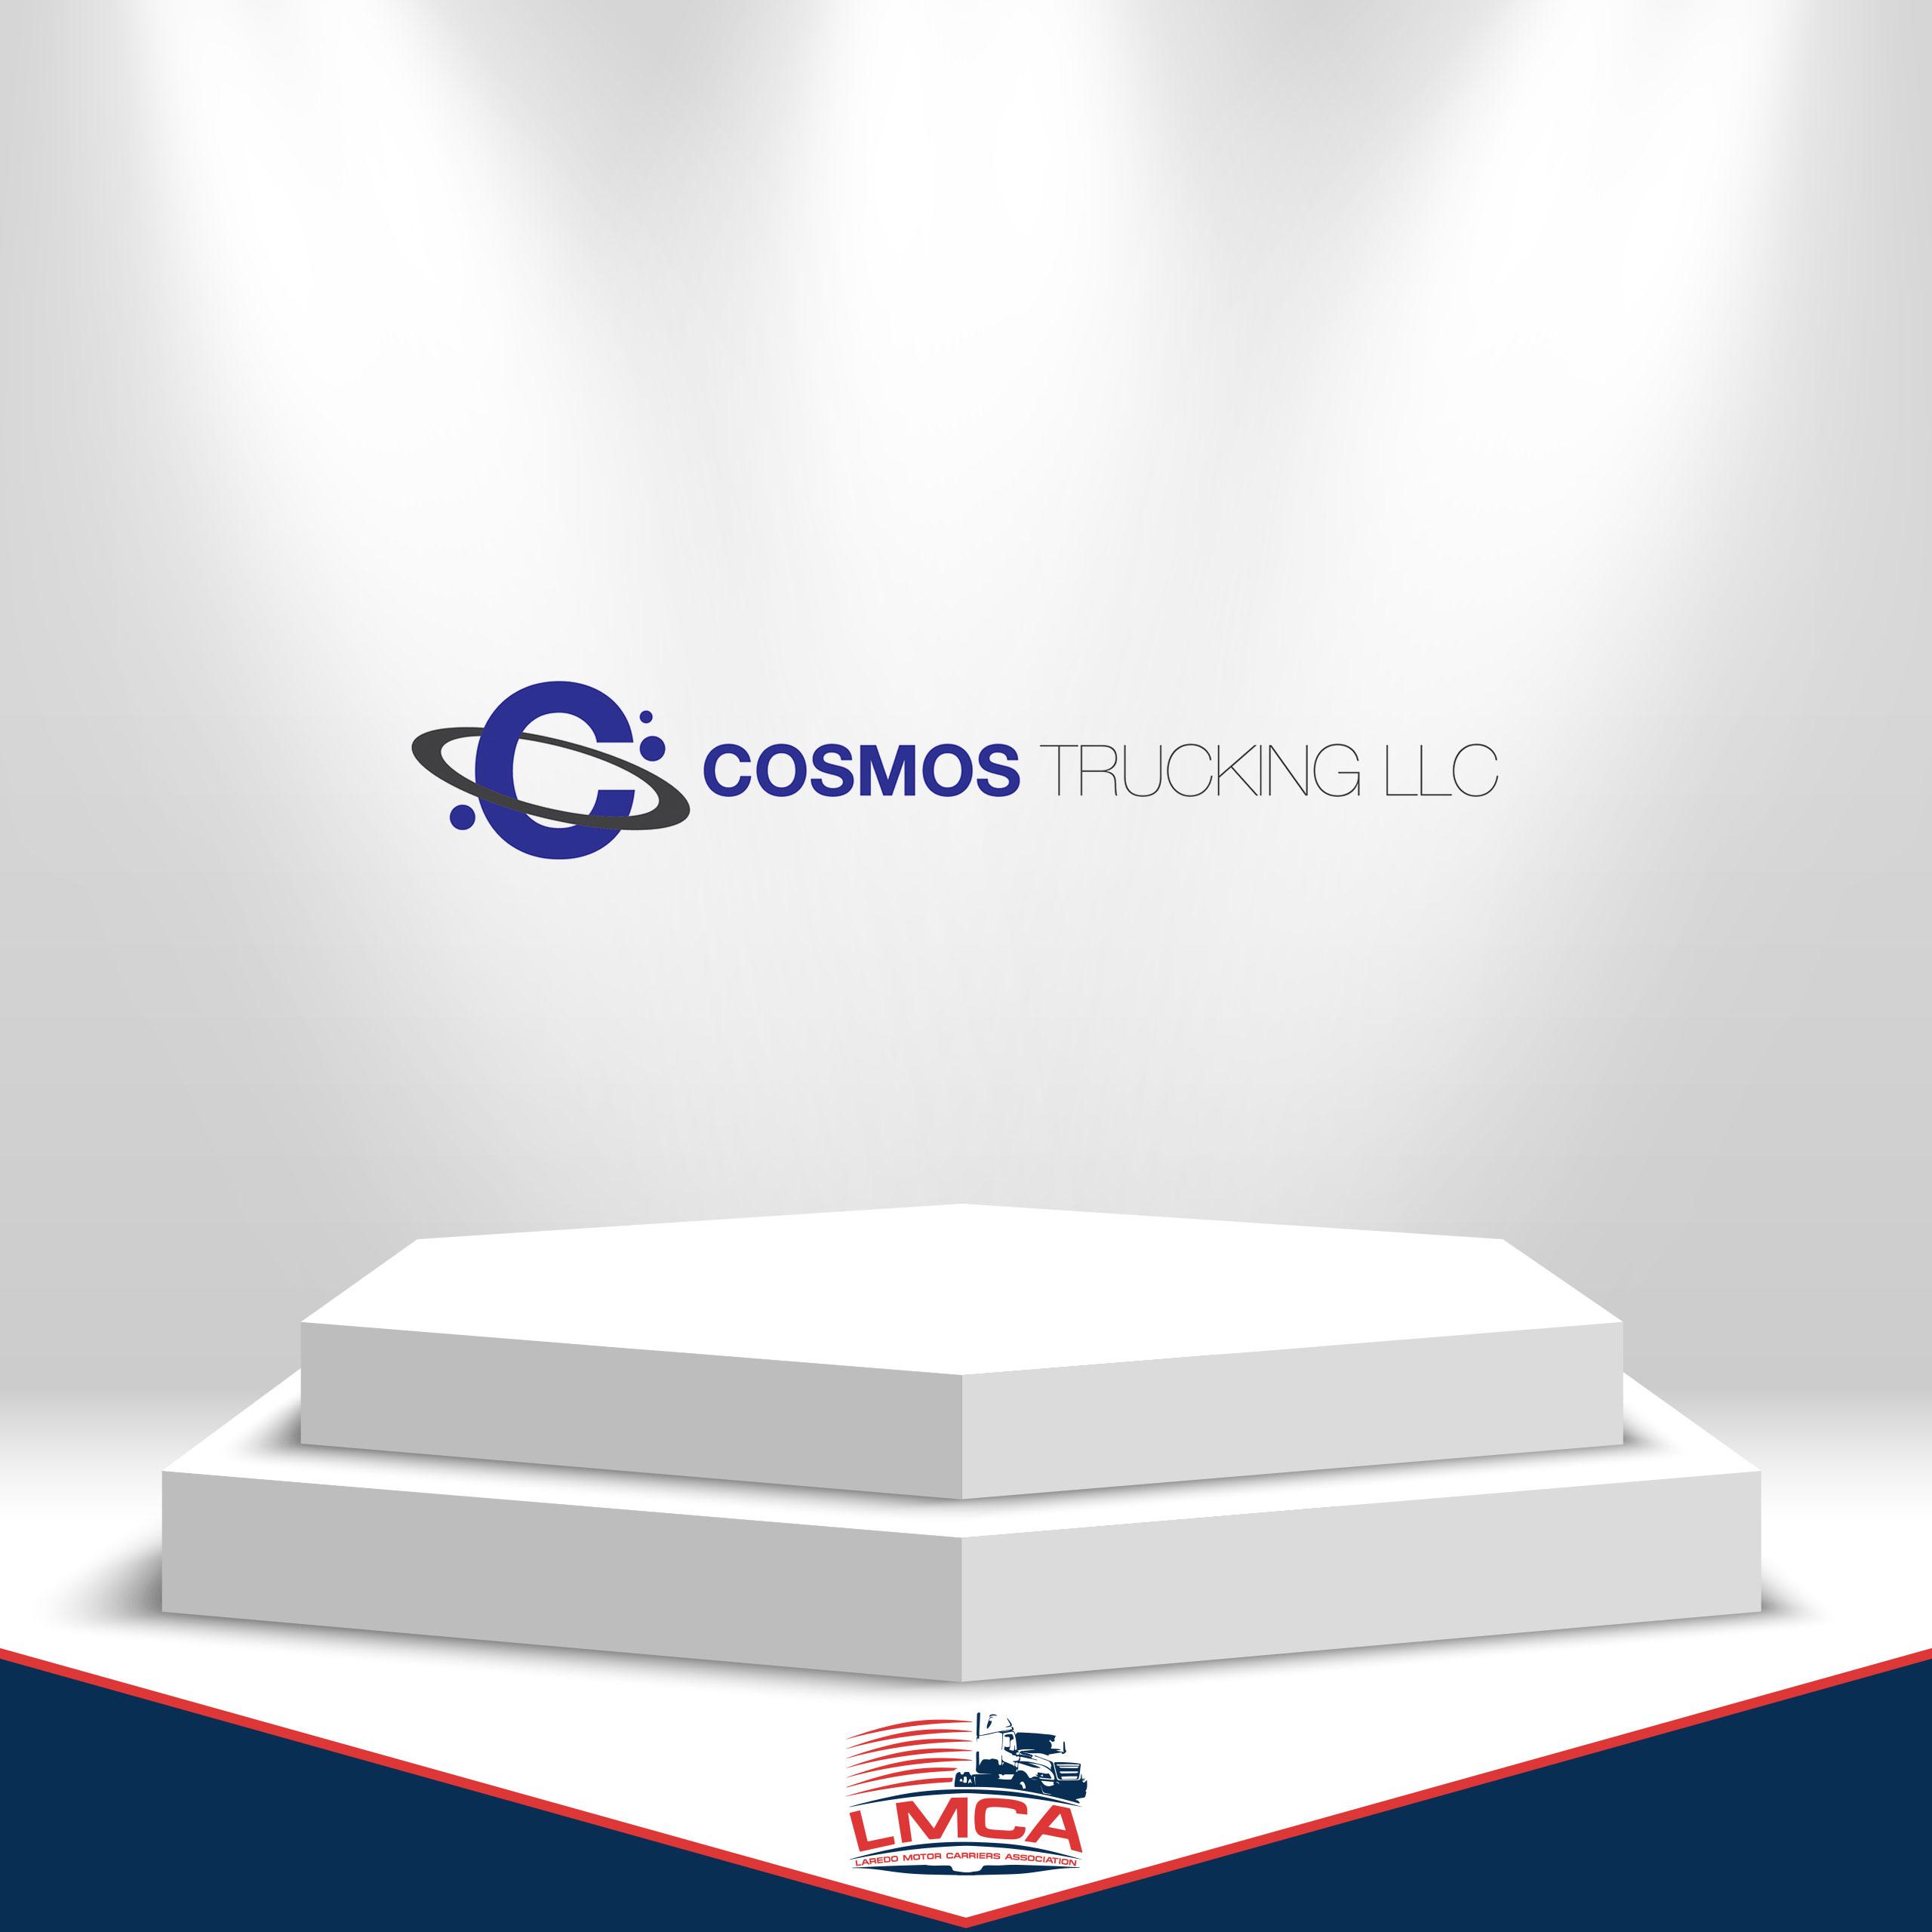 cosmos trucking